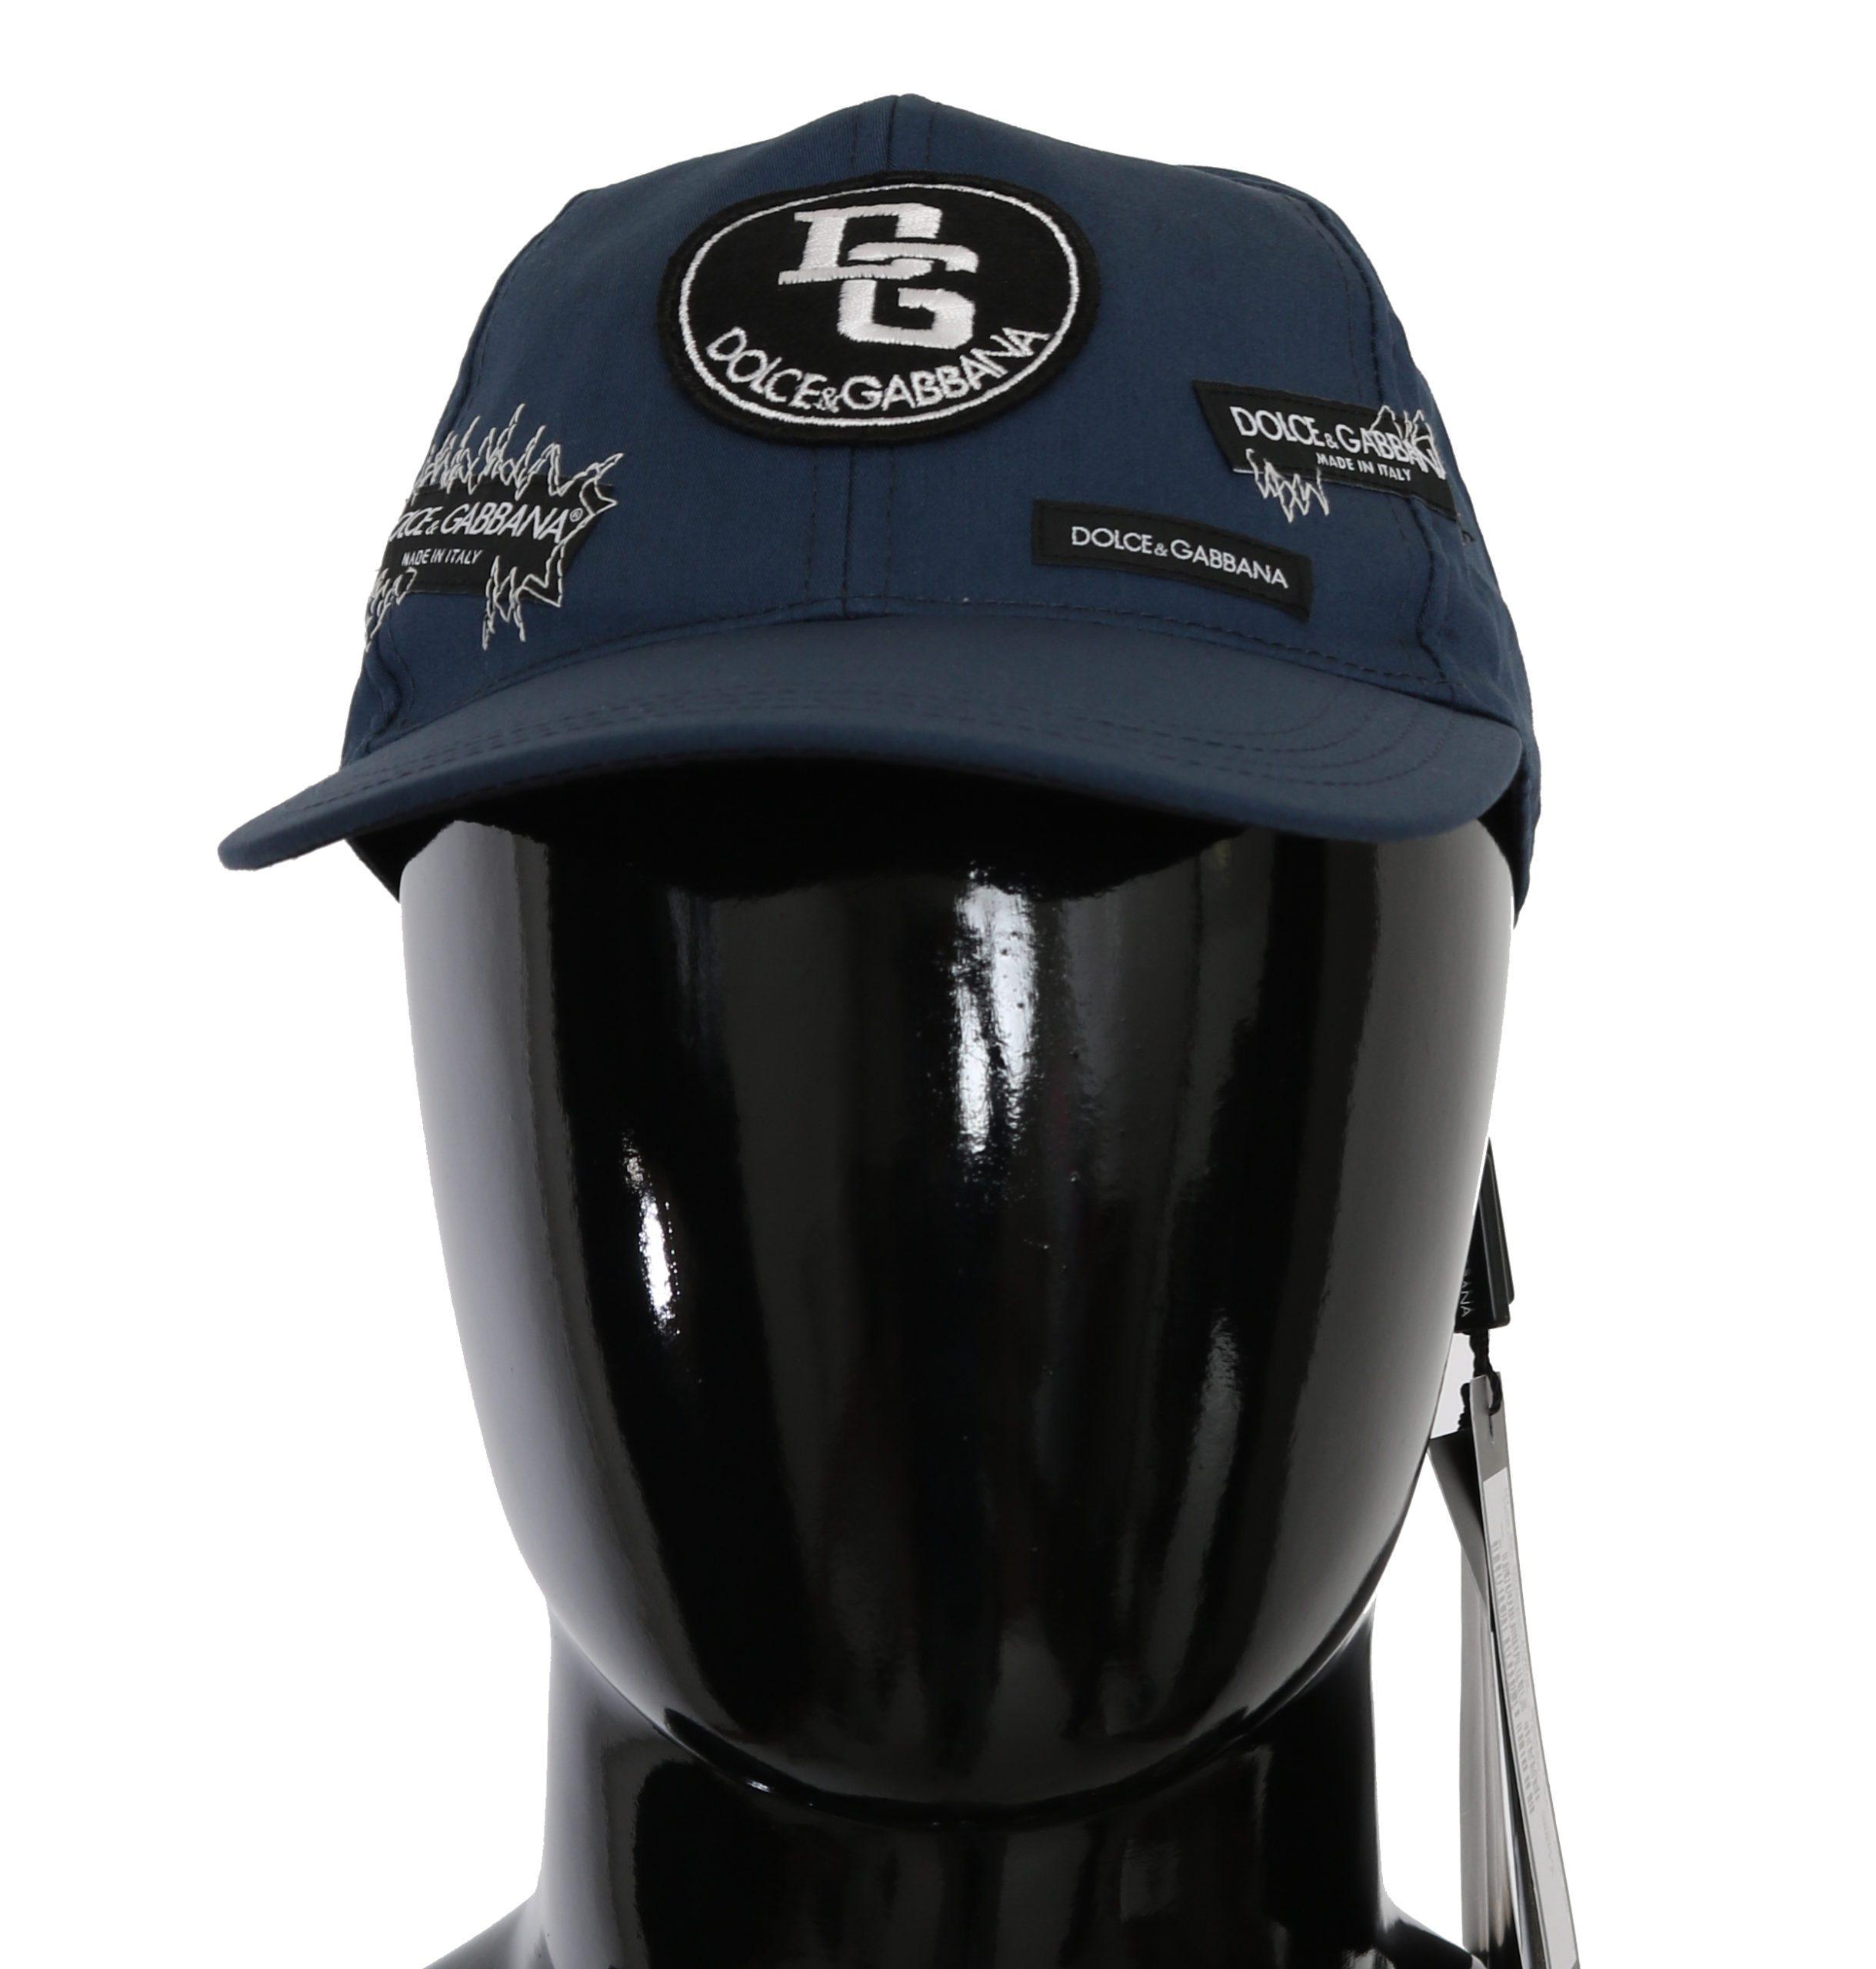 Dolce & Gabbana Men's Patch Baseball Cotton Stretch Hat Blue HAT9057 - 57 cm S